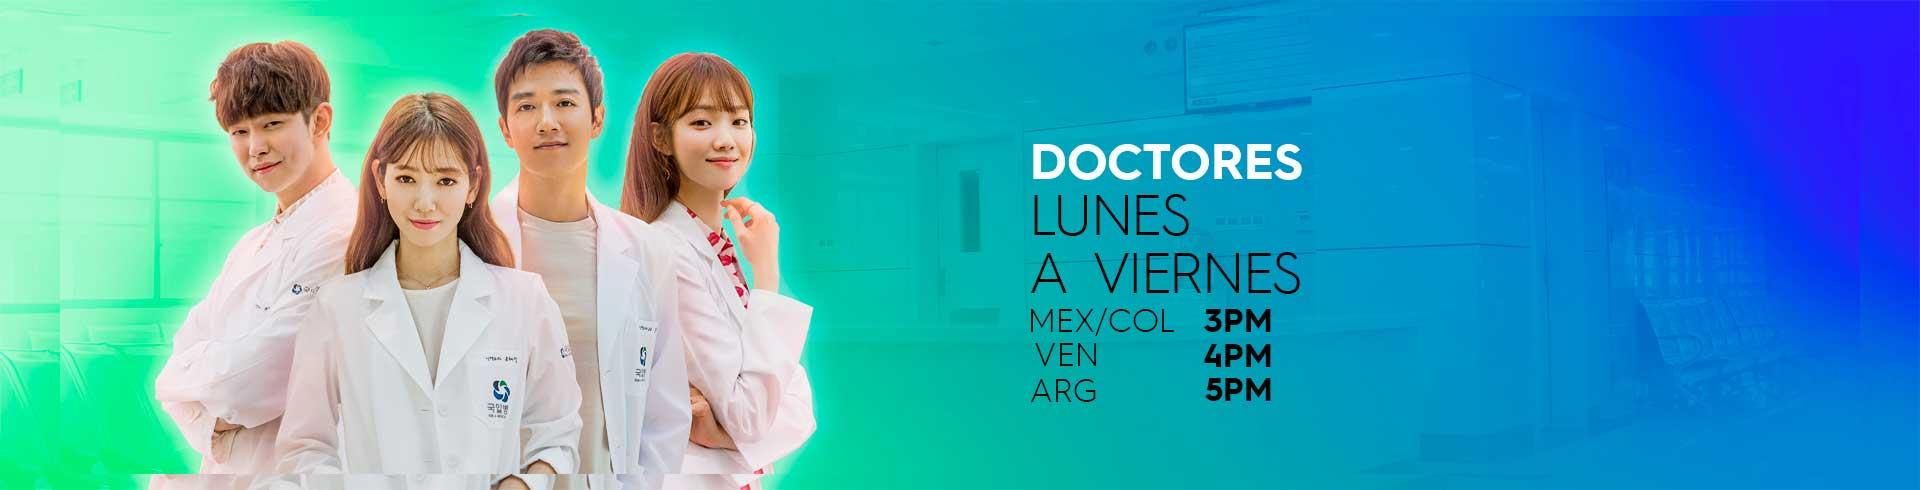 doctores-latam-banner